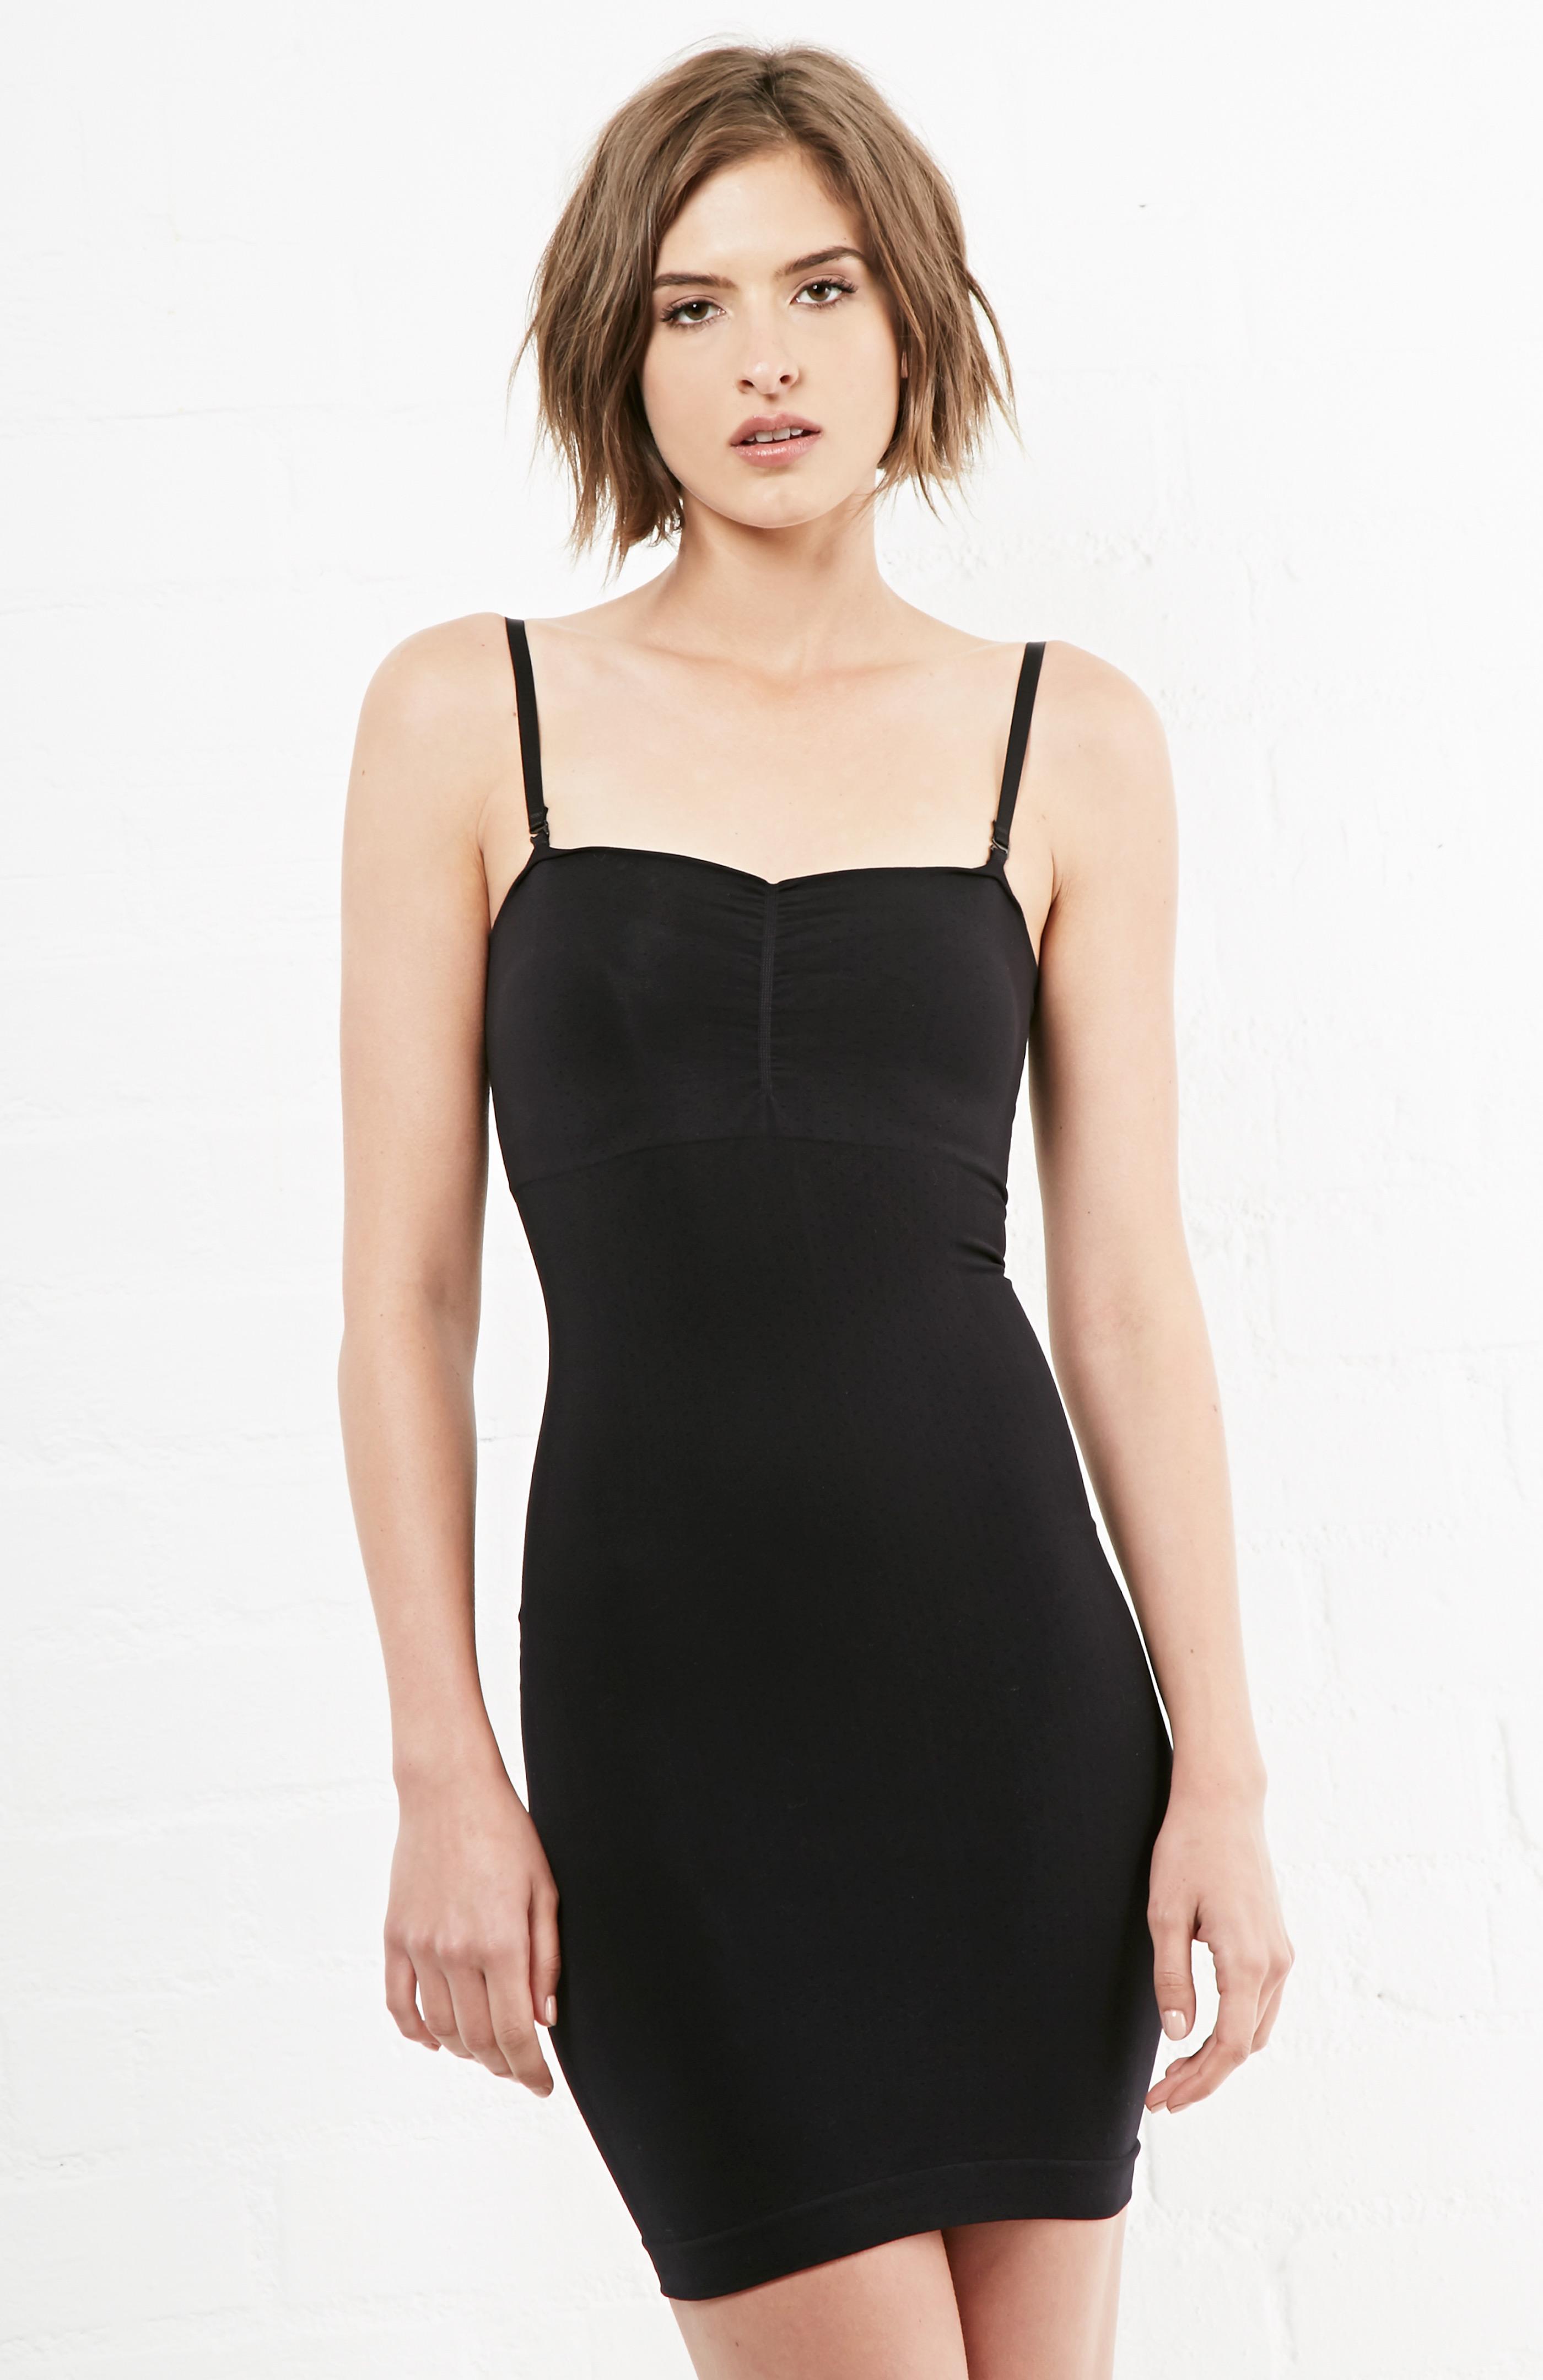 c15fed3cc2 Jewel Toned The Major Mini Slip Dress in Black